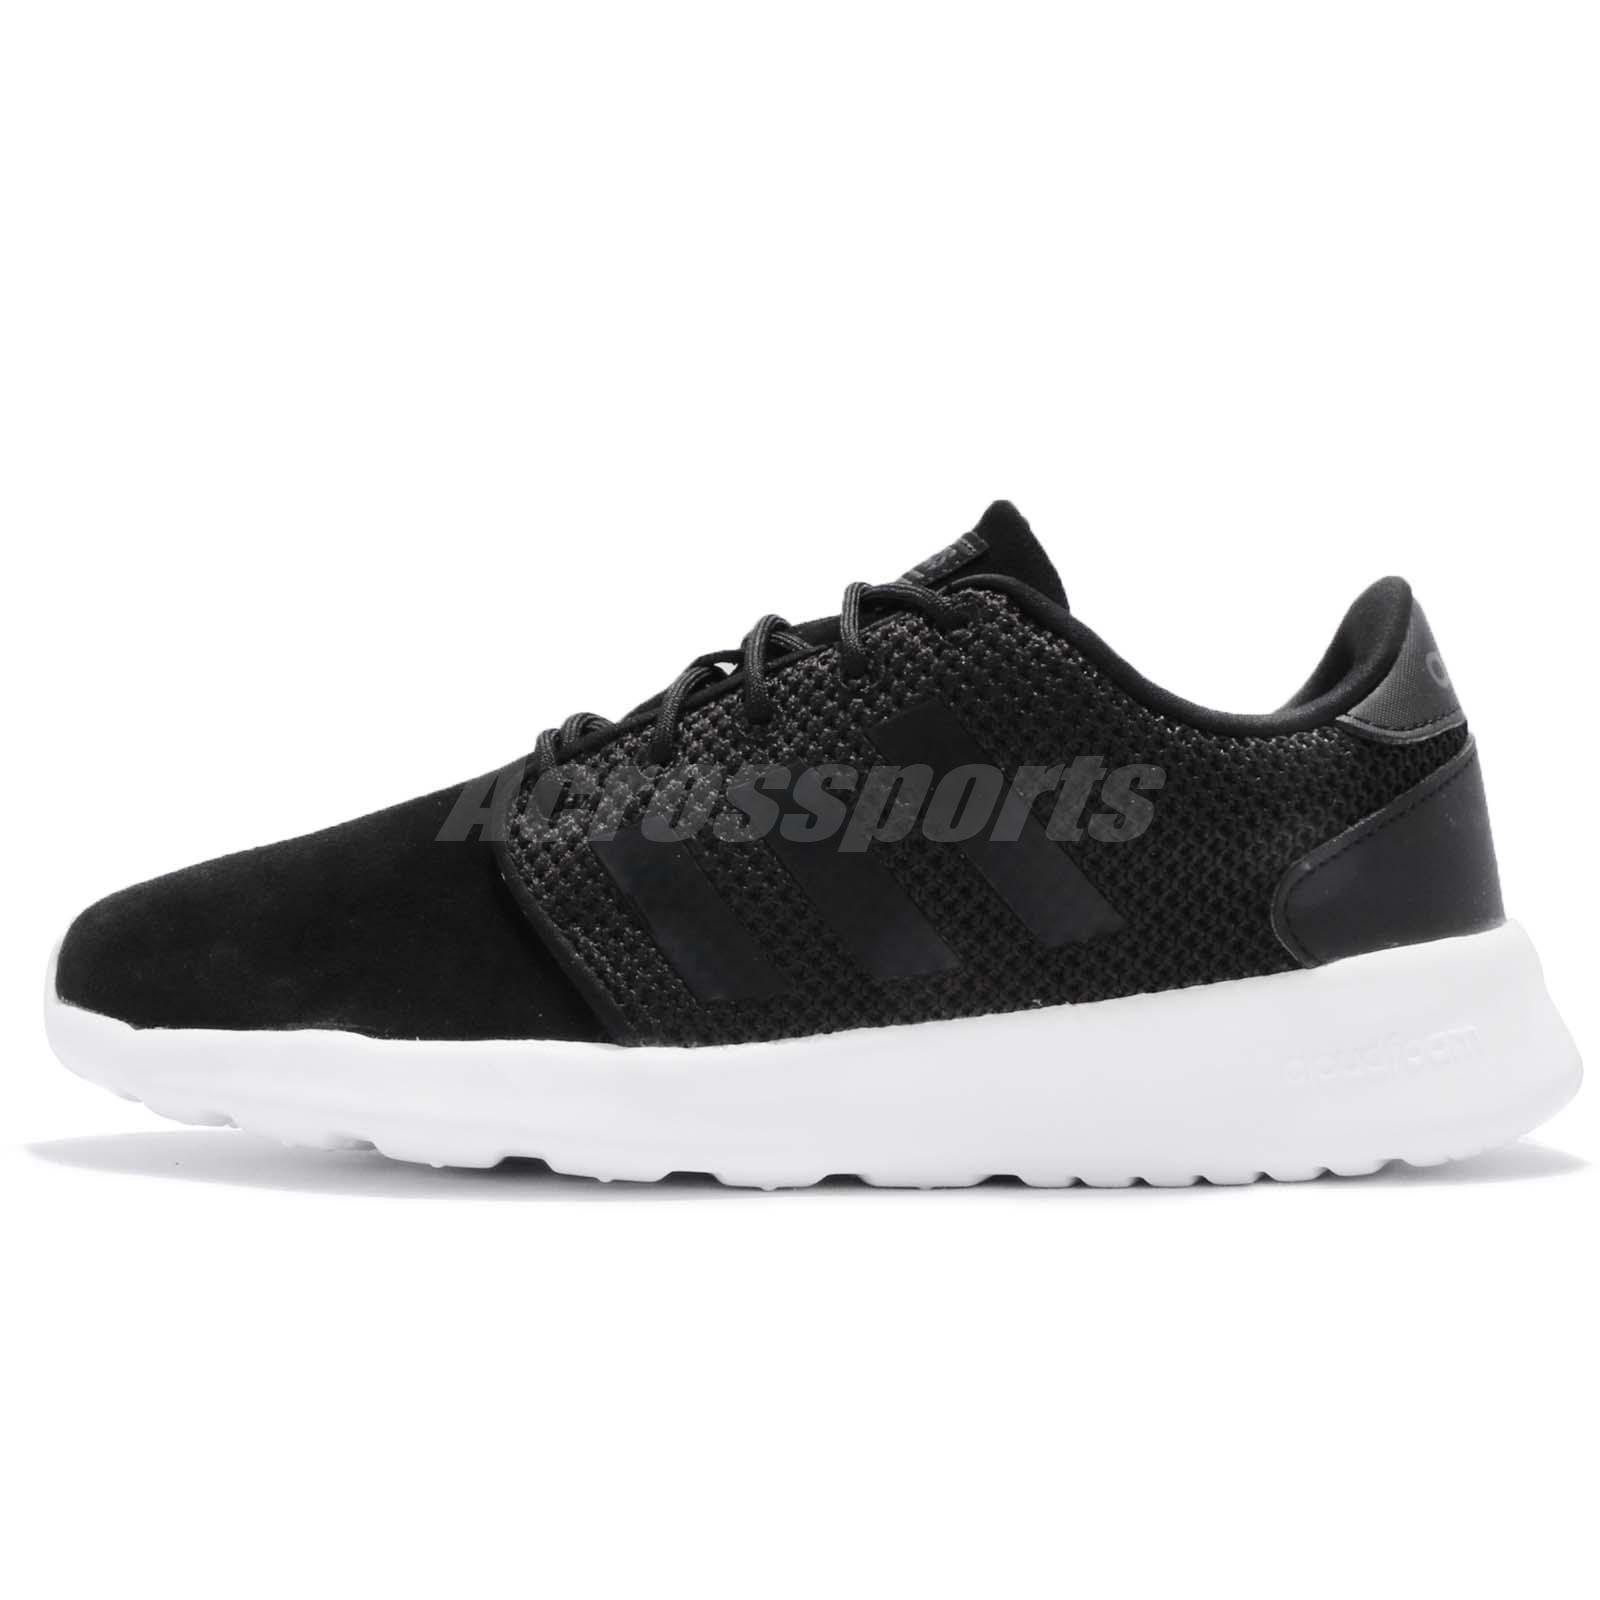 Adidas di qt racer w bianco nero le donne scarpe da ginnastica